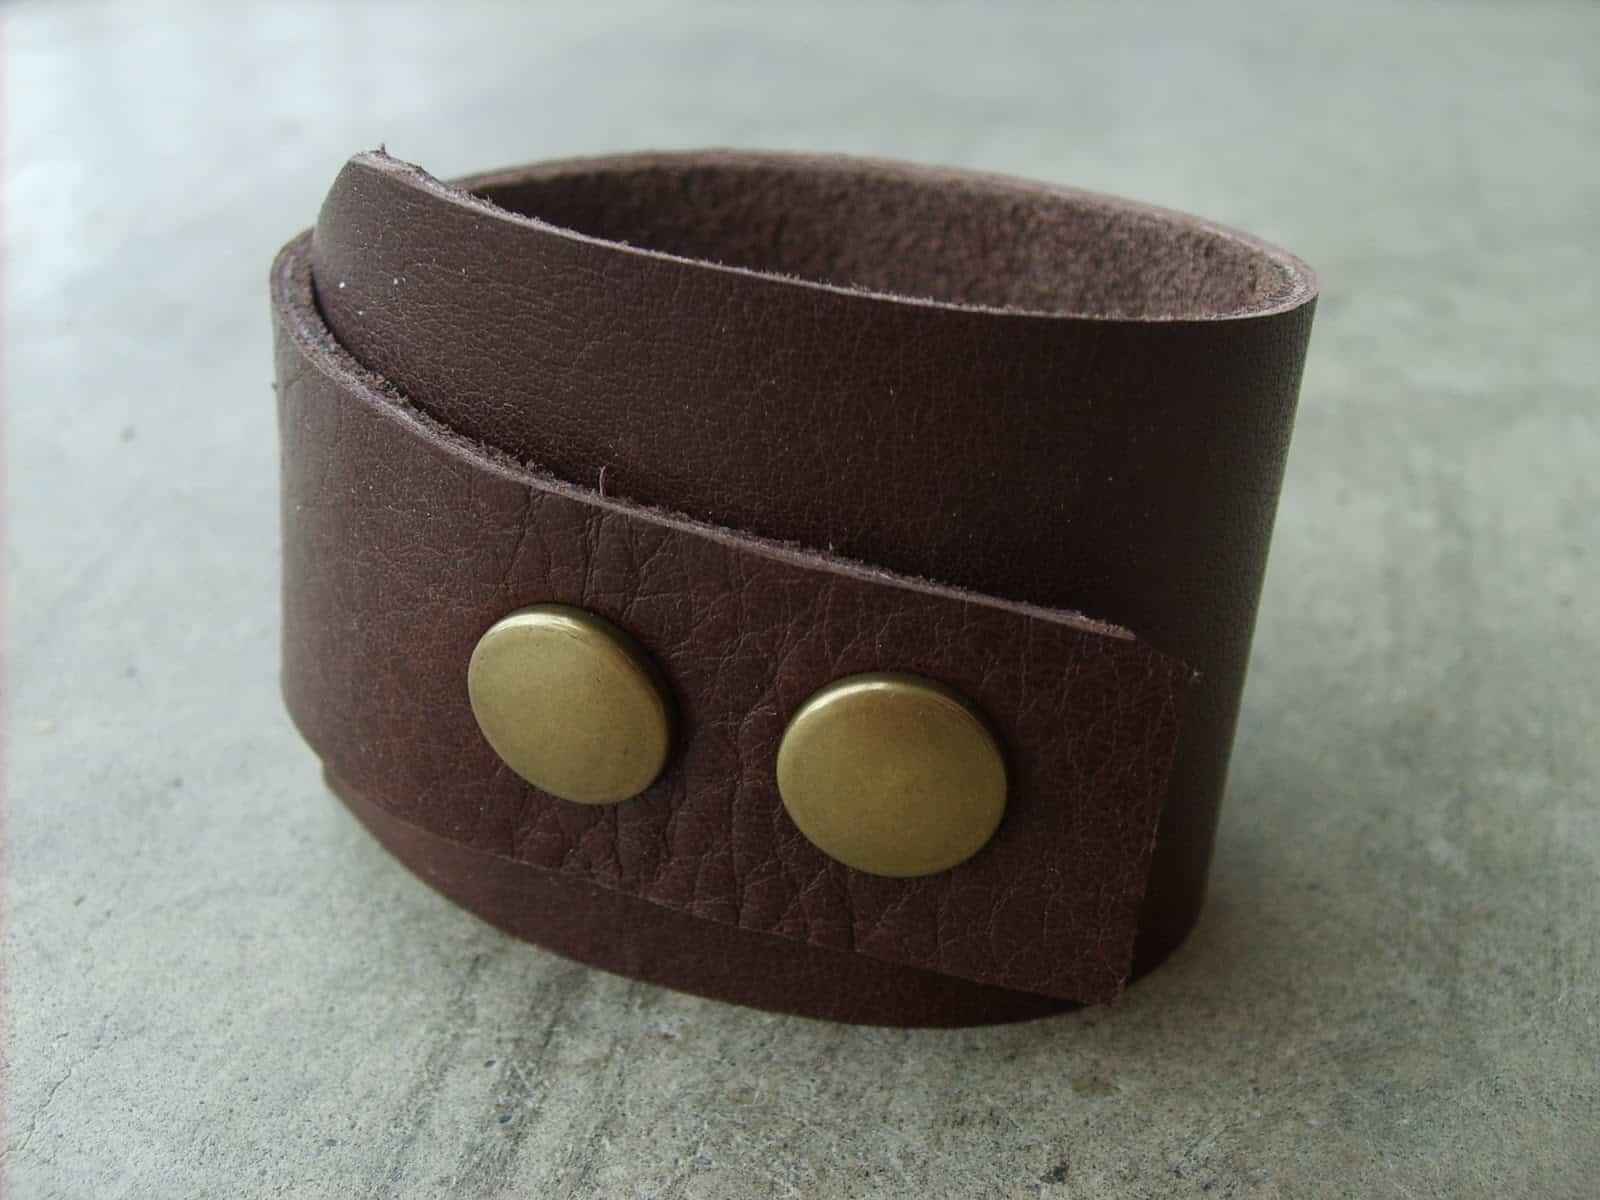 Trendy leather cuff